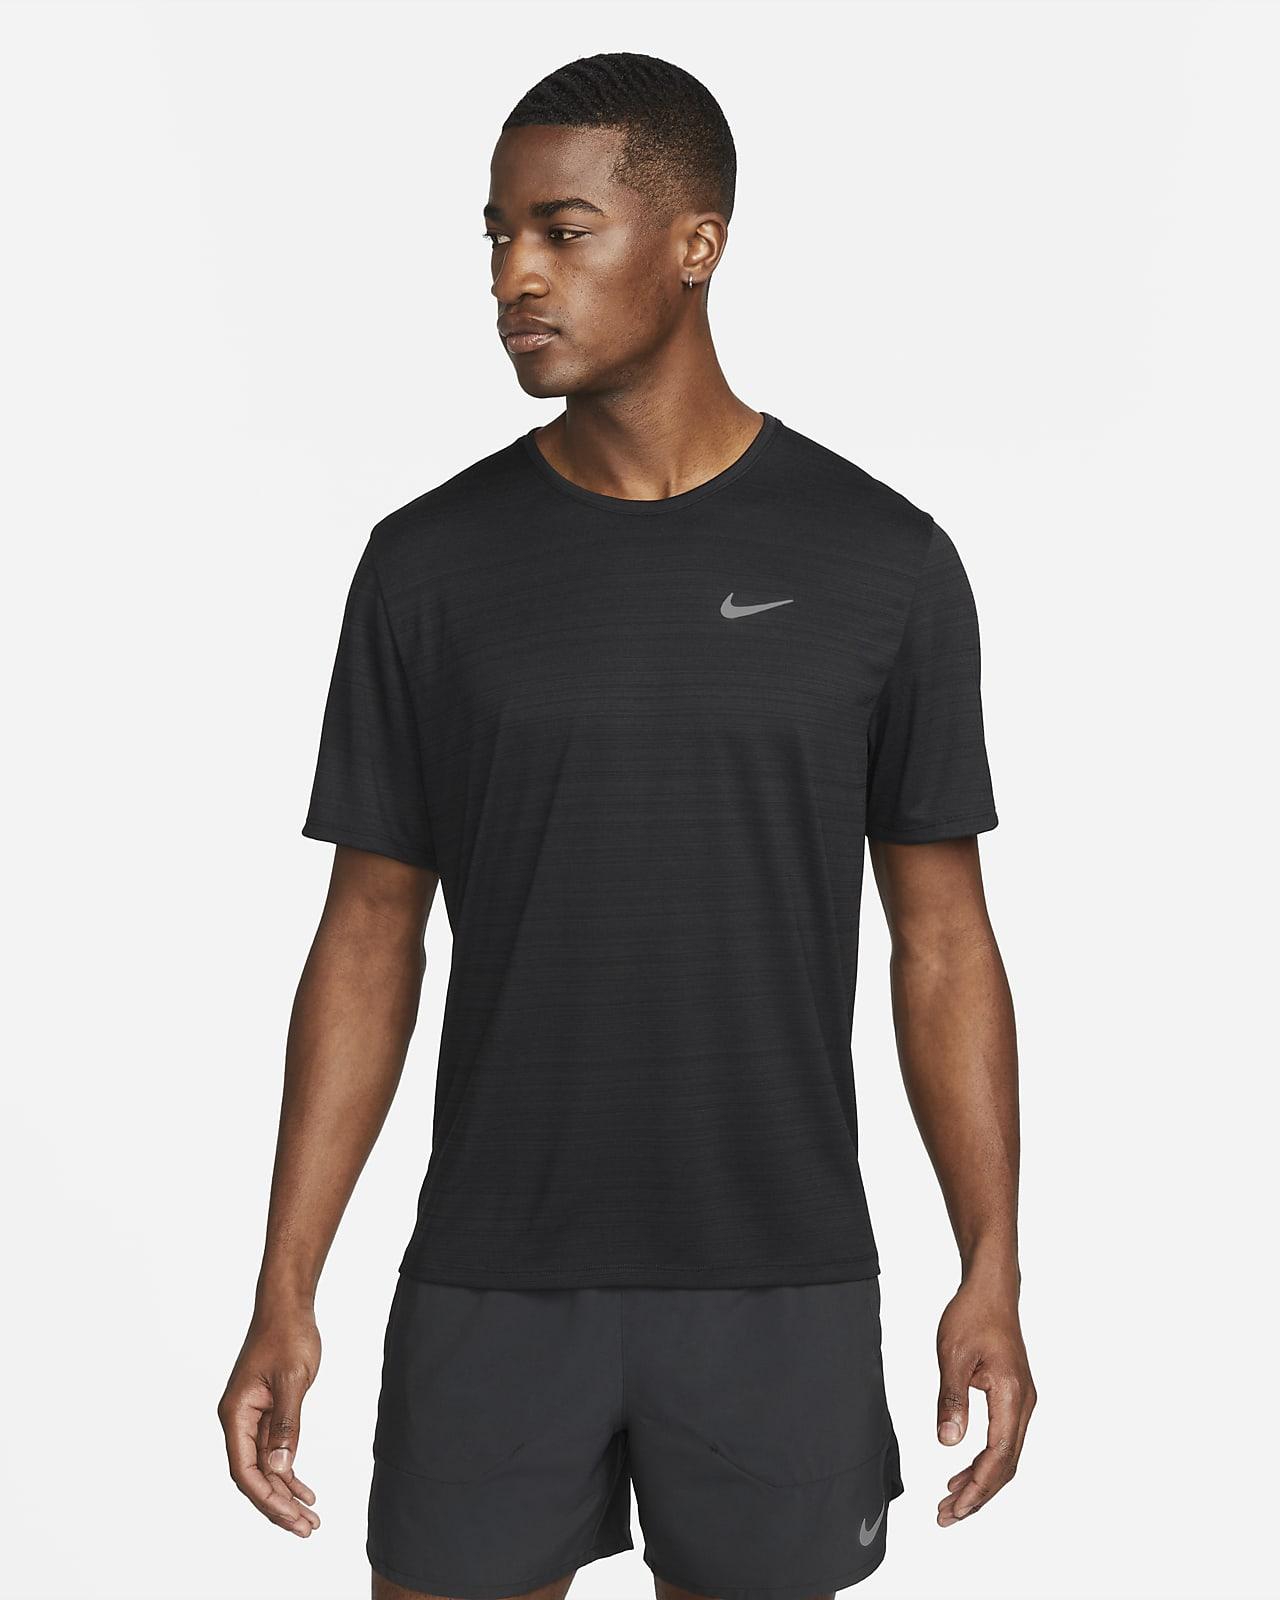 Maglia da running Nike Dri-FIT Miler - Uomo